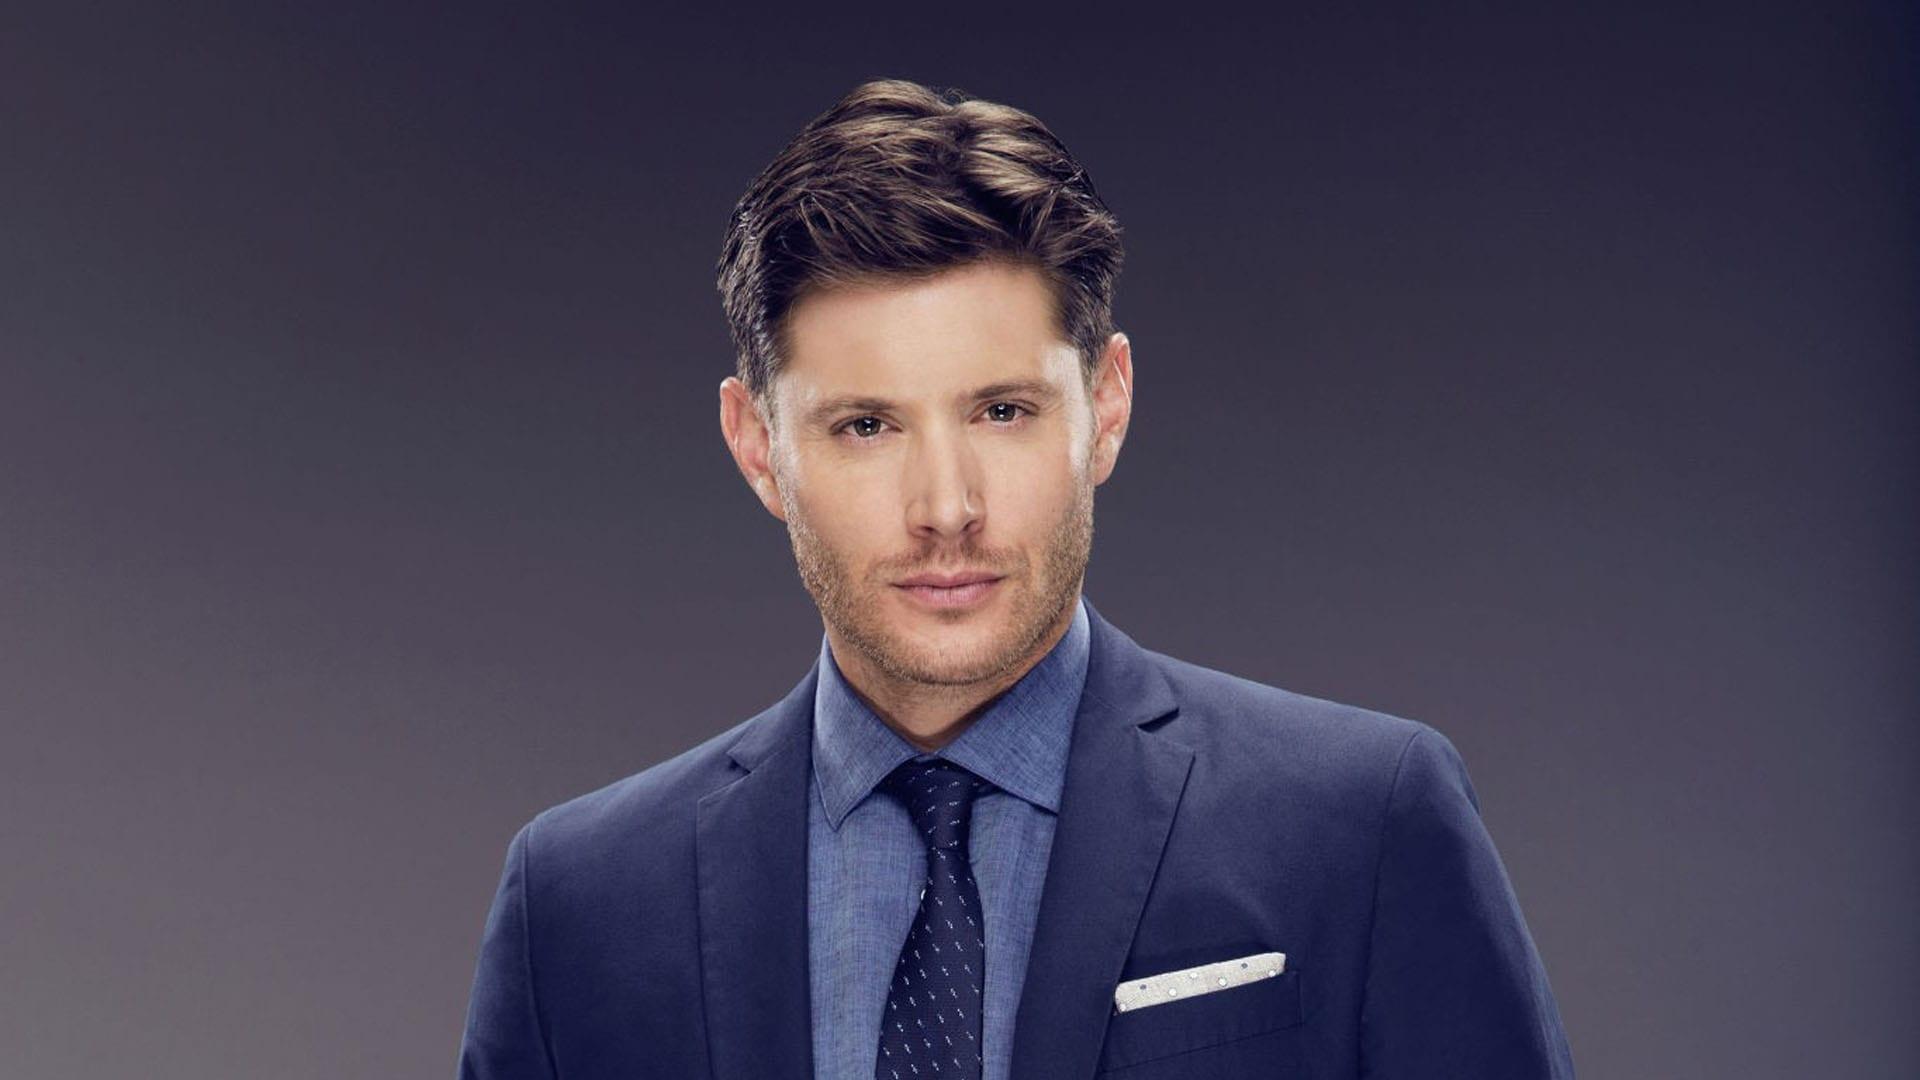 Jensen Ackles Pictures